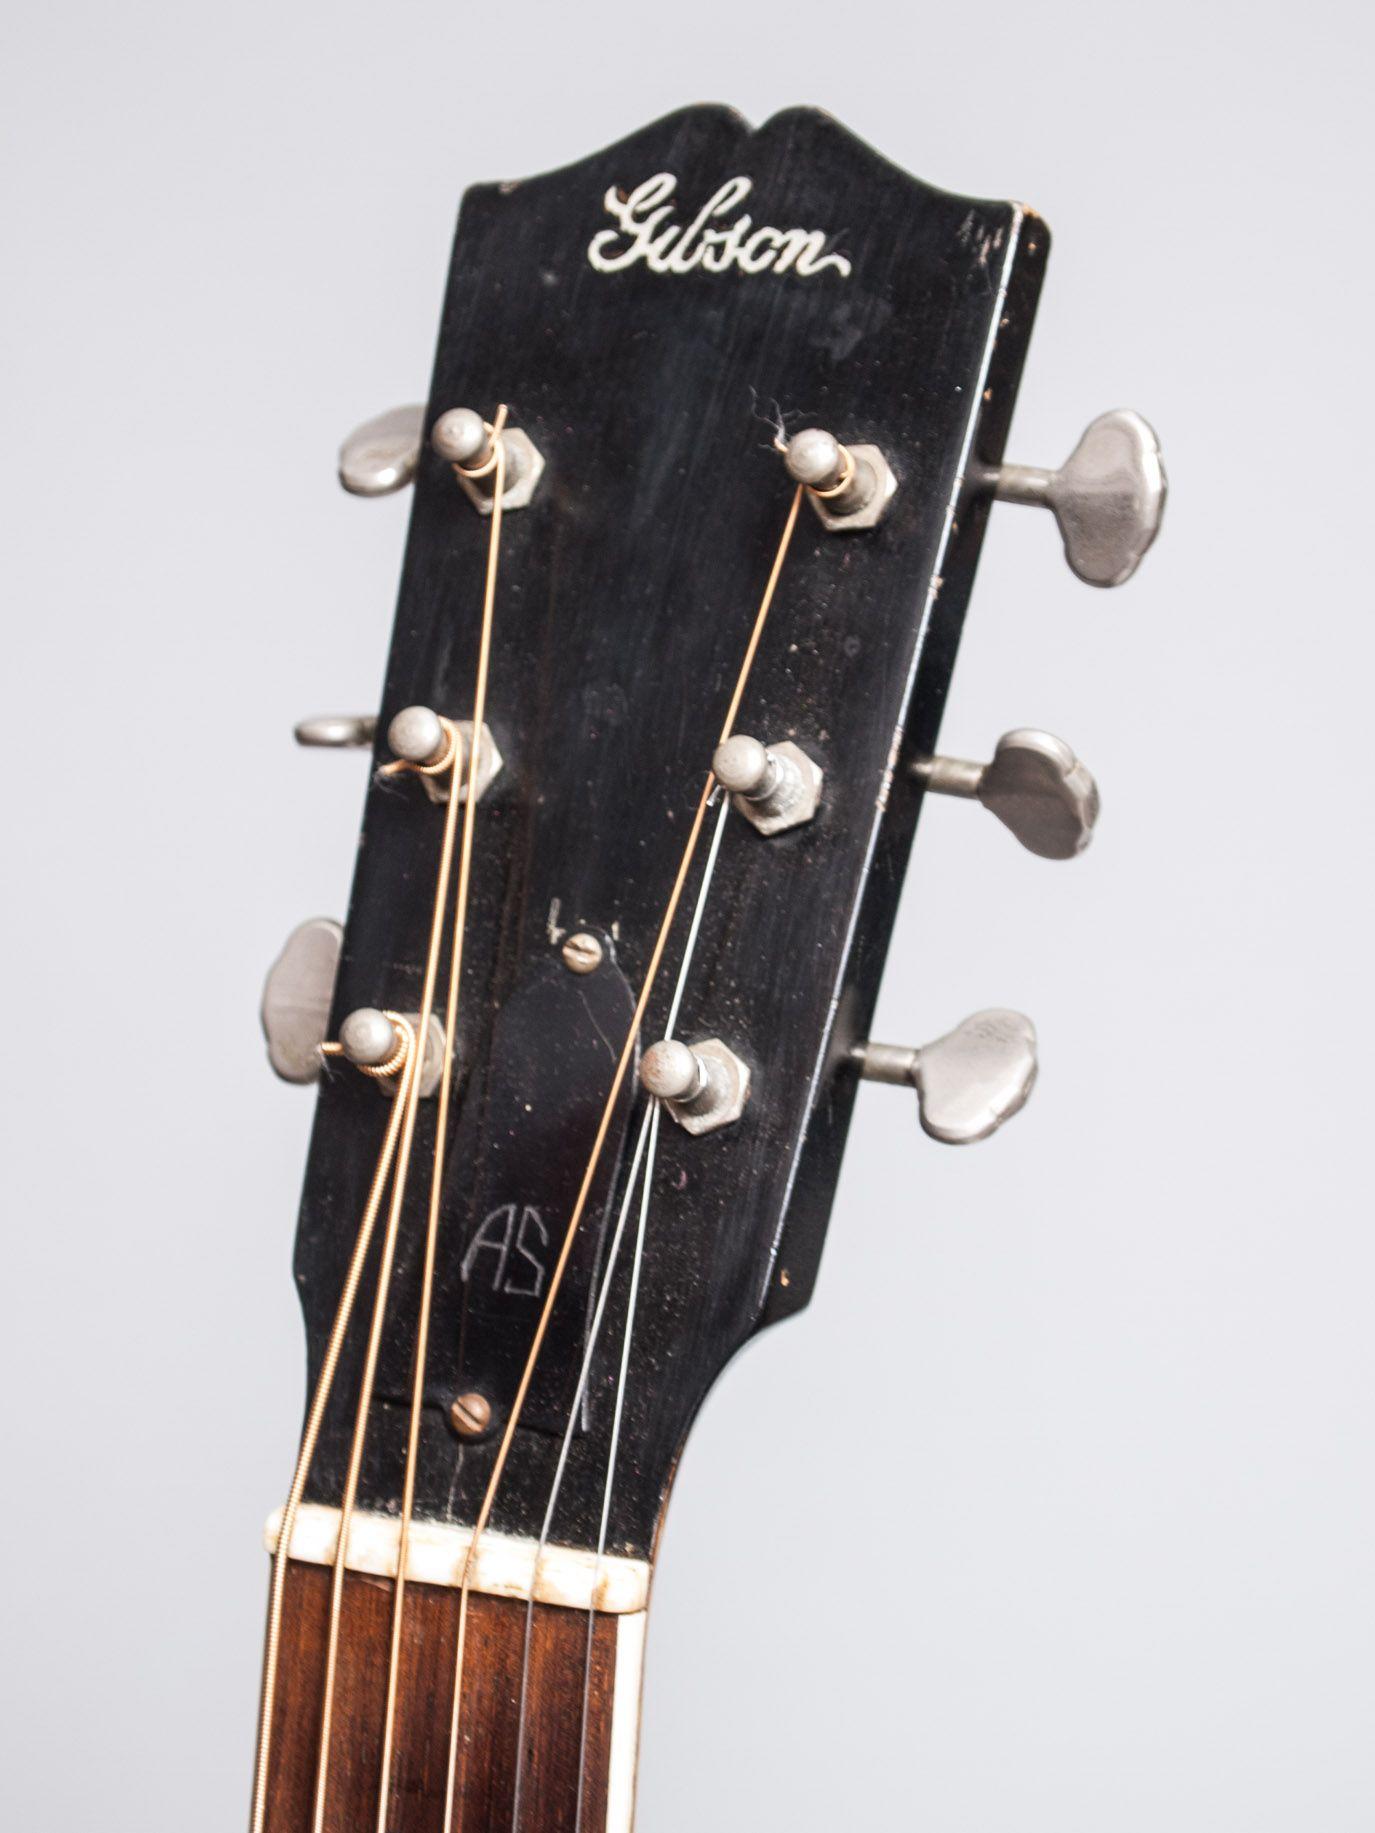 1930 gibson black l 10 instruments for sale guitar acoustic guitar instruments. Black Bedroom Furniture Sets. Home Design Ideas